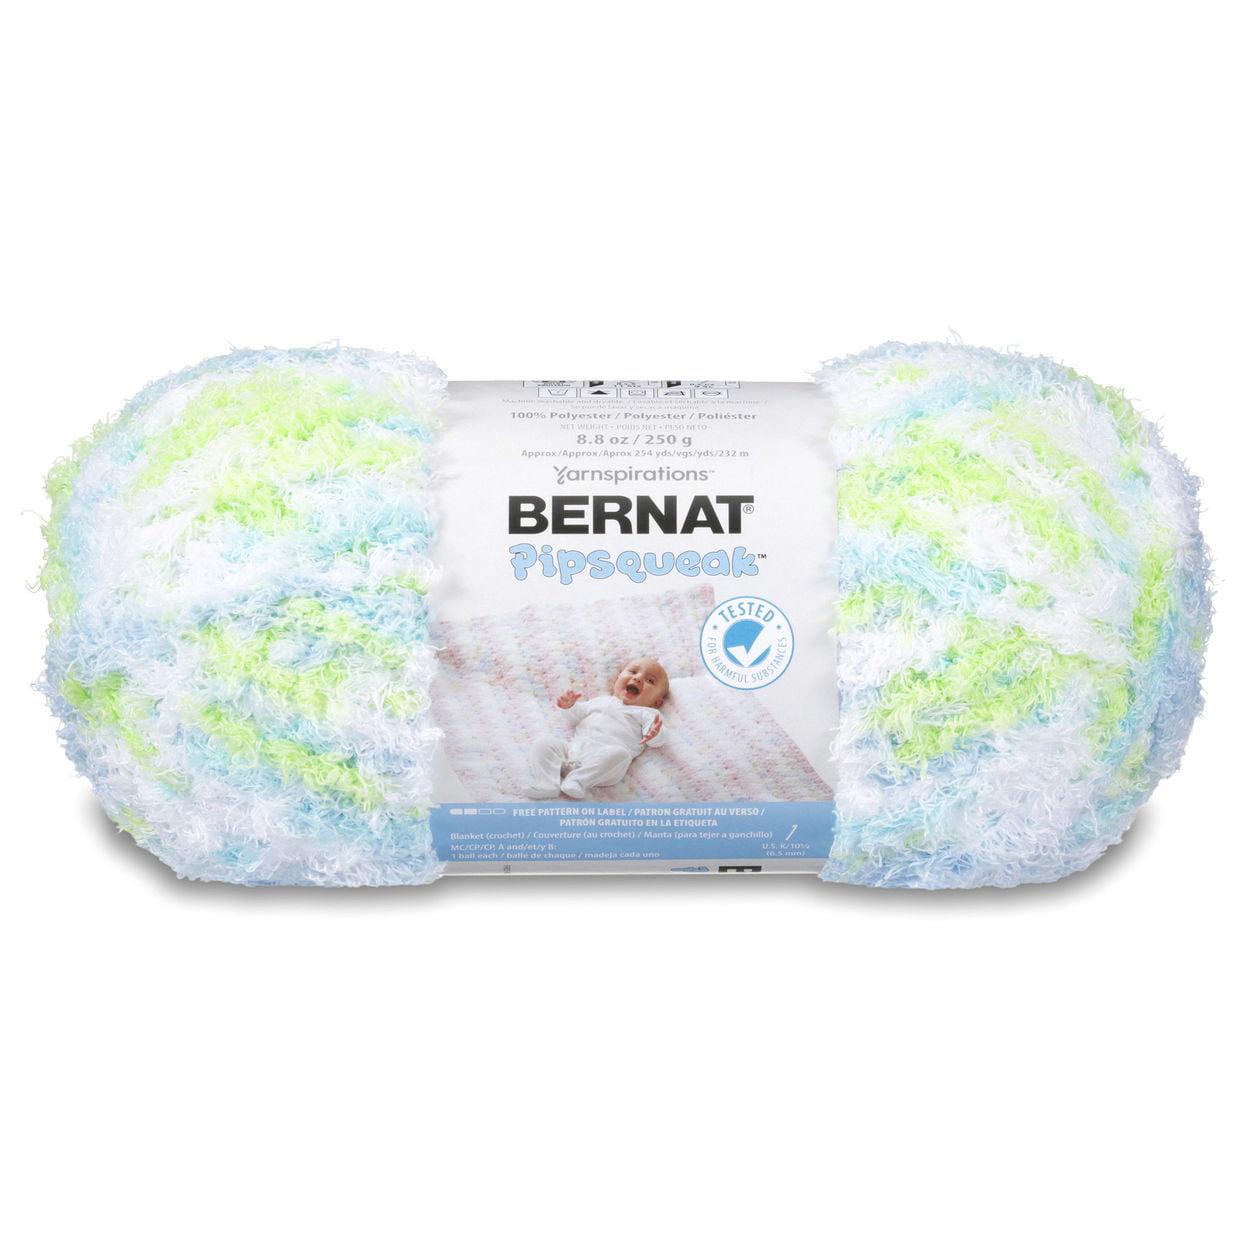 Bernat Pipsqueak Small Ball Yarn